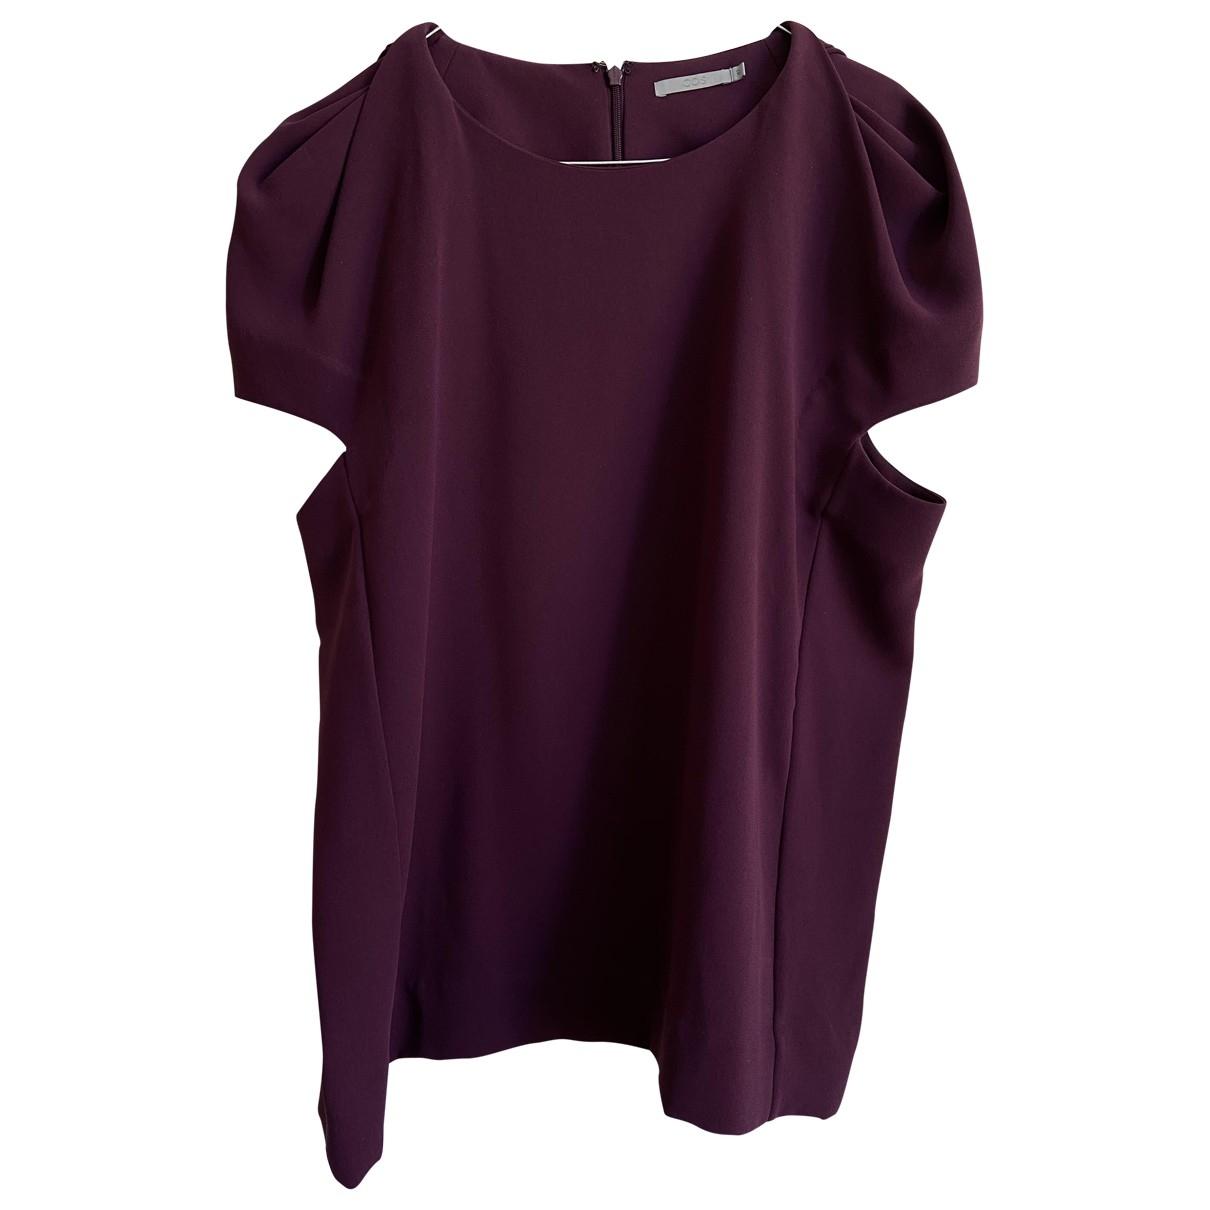 Cos \N Purple  top for Women M International